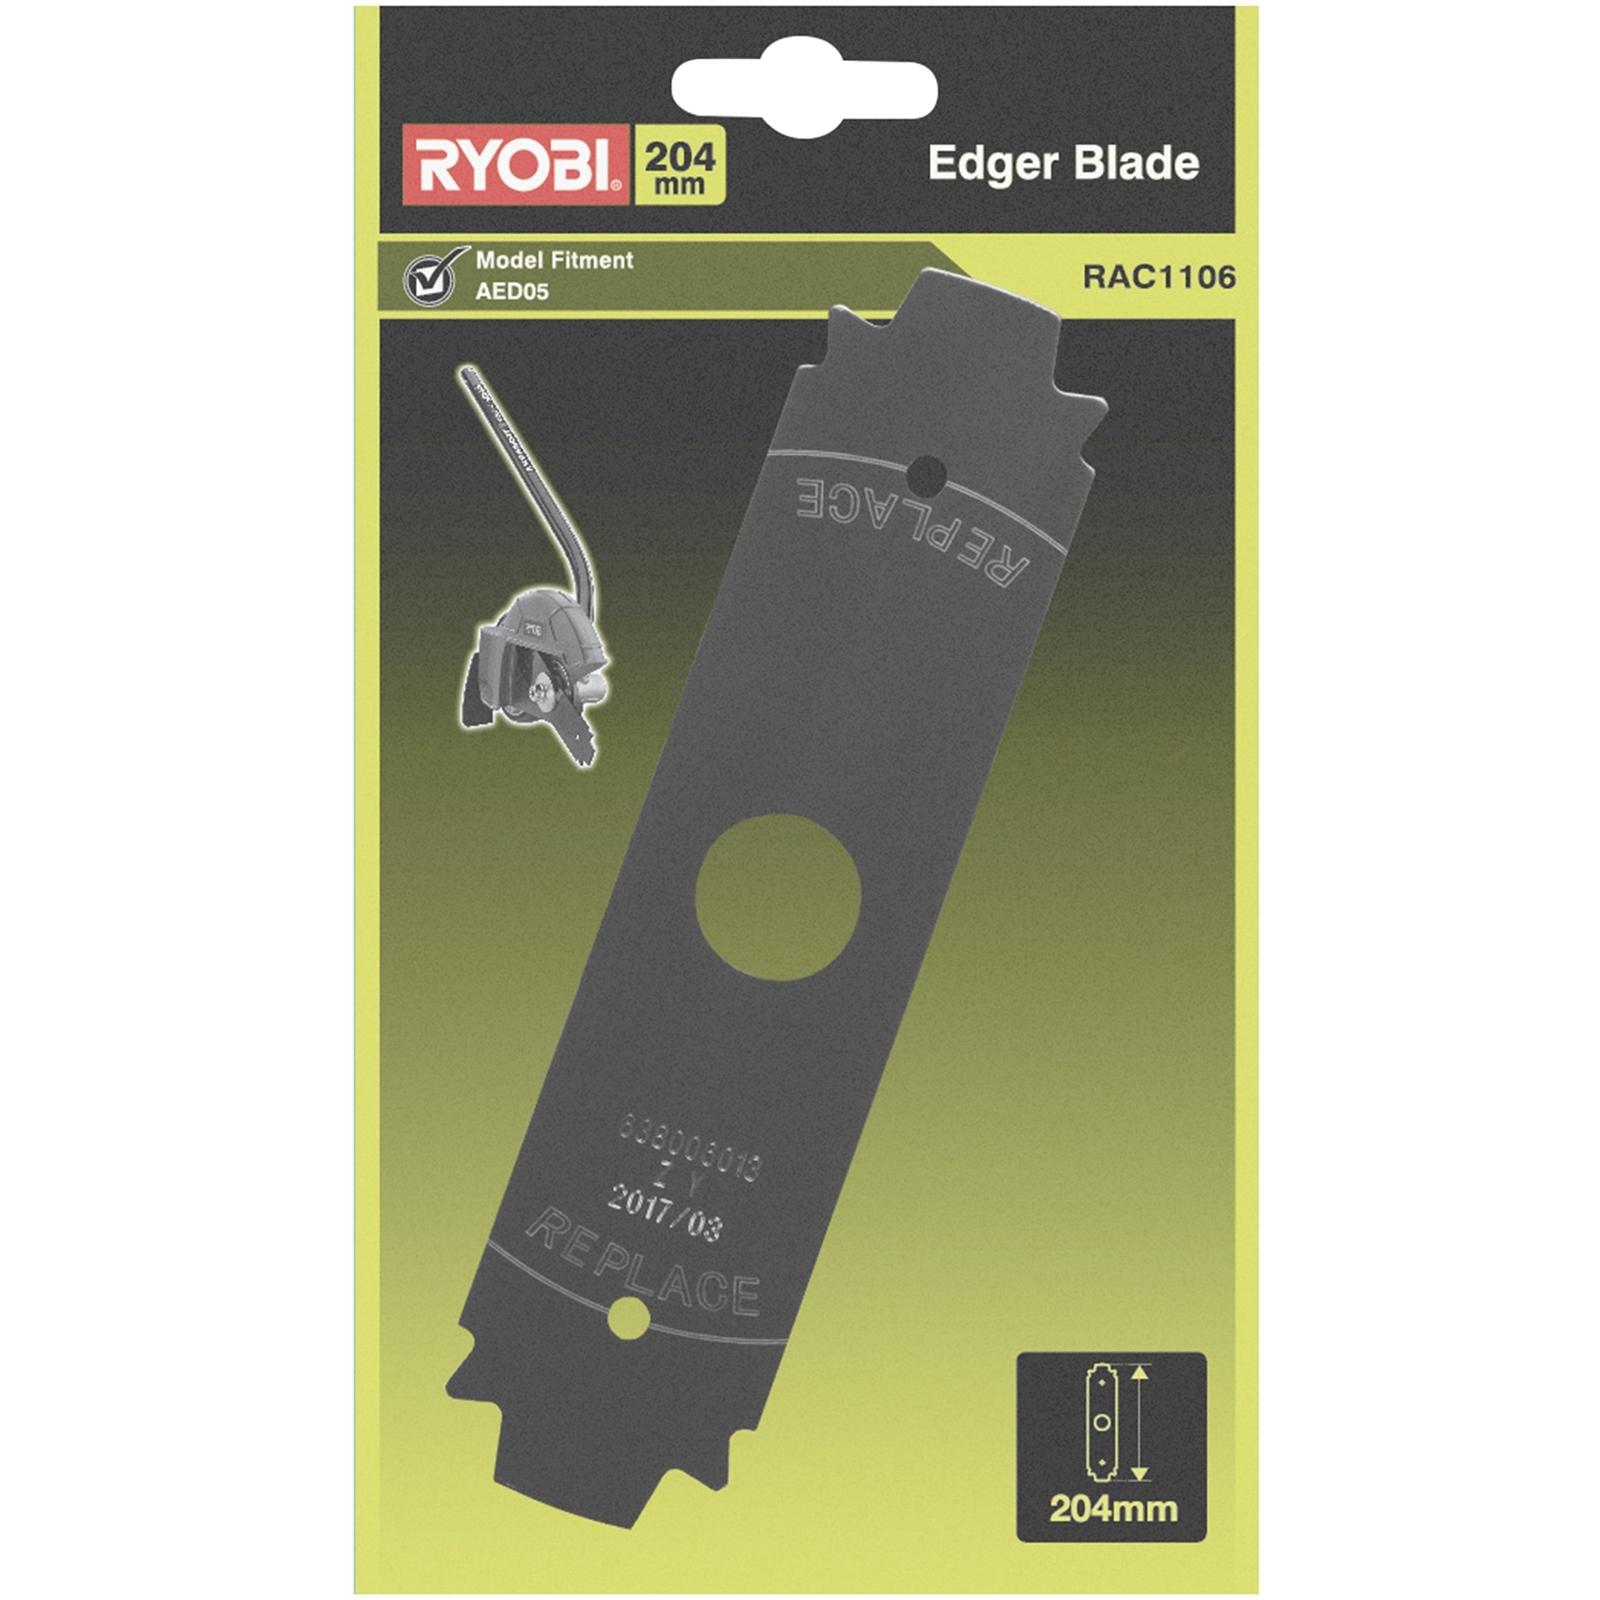 Ryobi 204mm Edger Blade